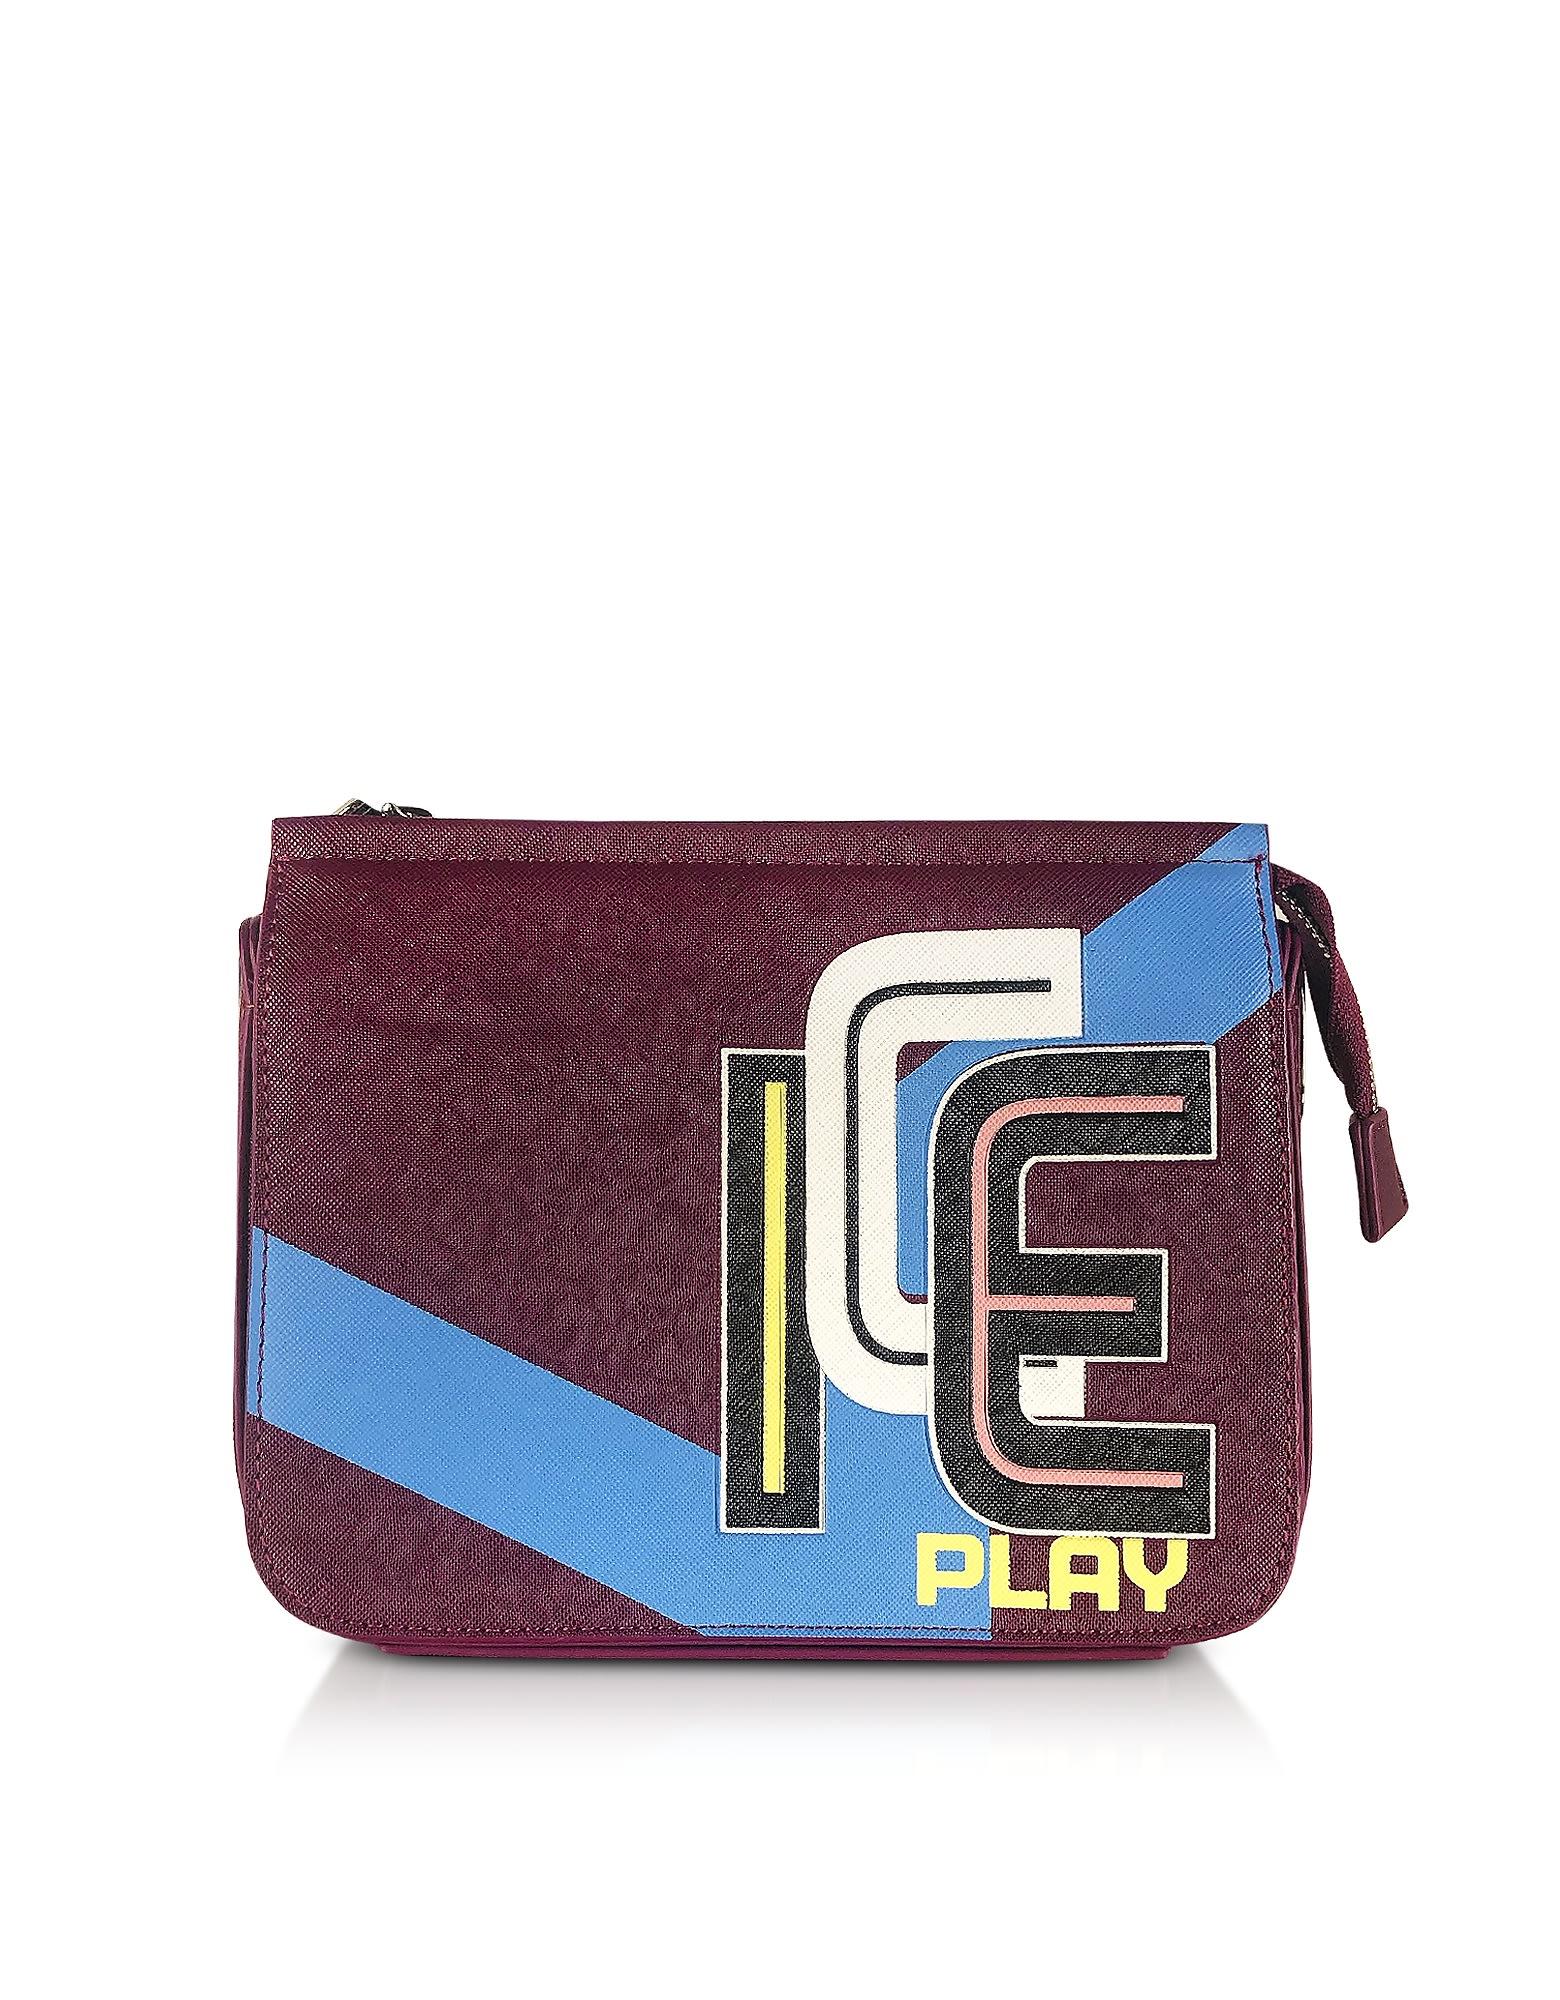 Ice Play Color Block Saffiano Eco Leather Camera Bag